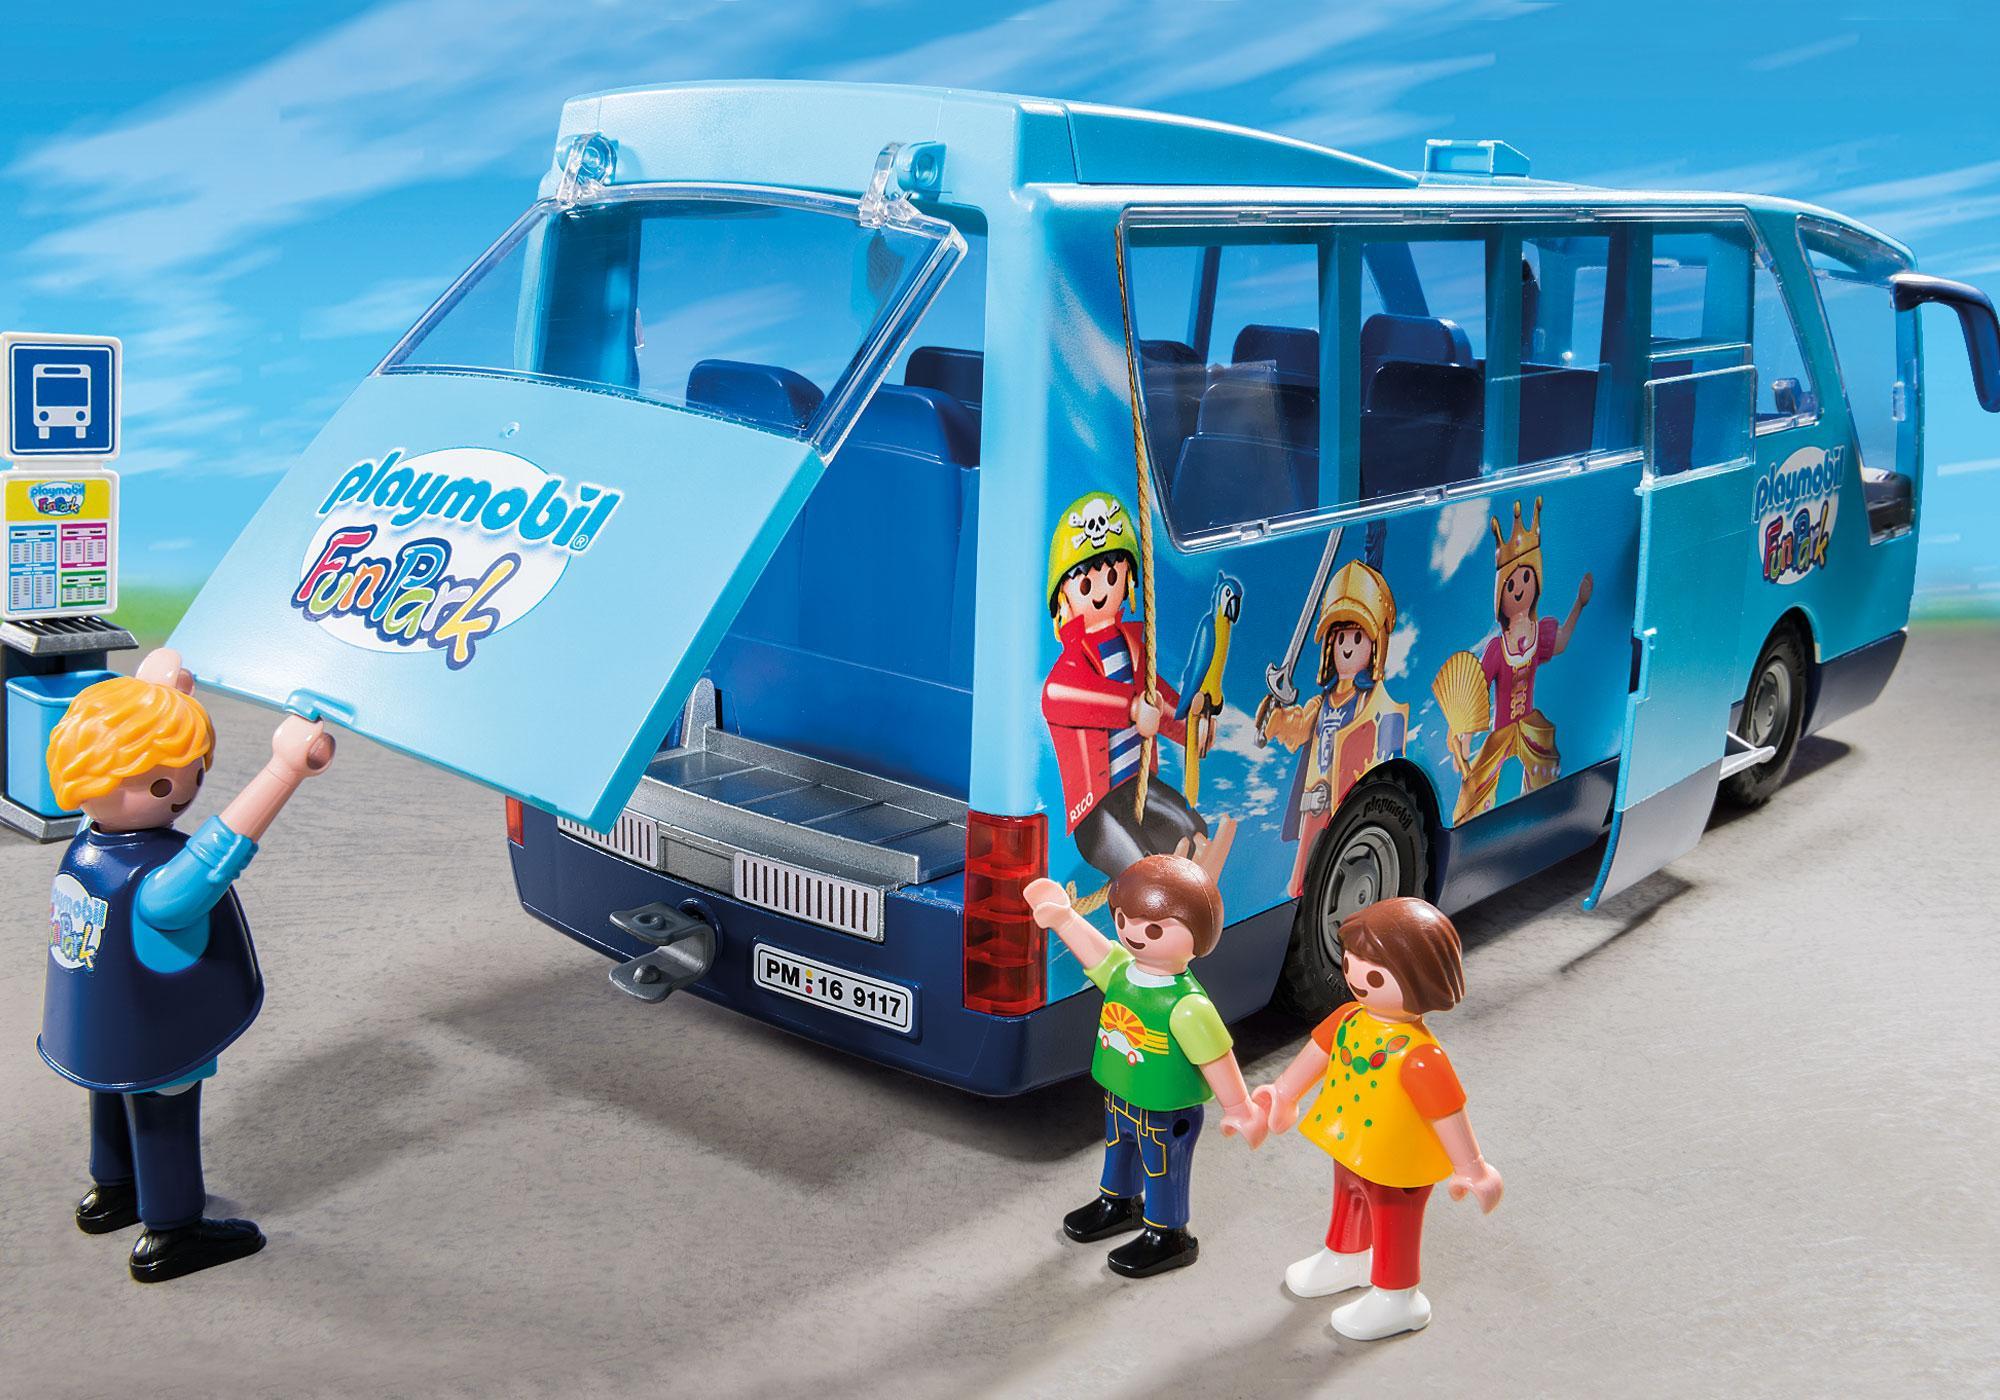 http://media.playmobil.com/i/playmobil/9117_product_extra3/PLAYMOBIL-FunPark skolebus